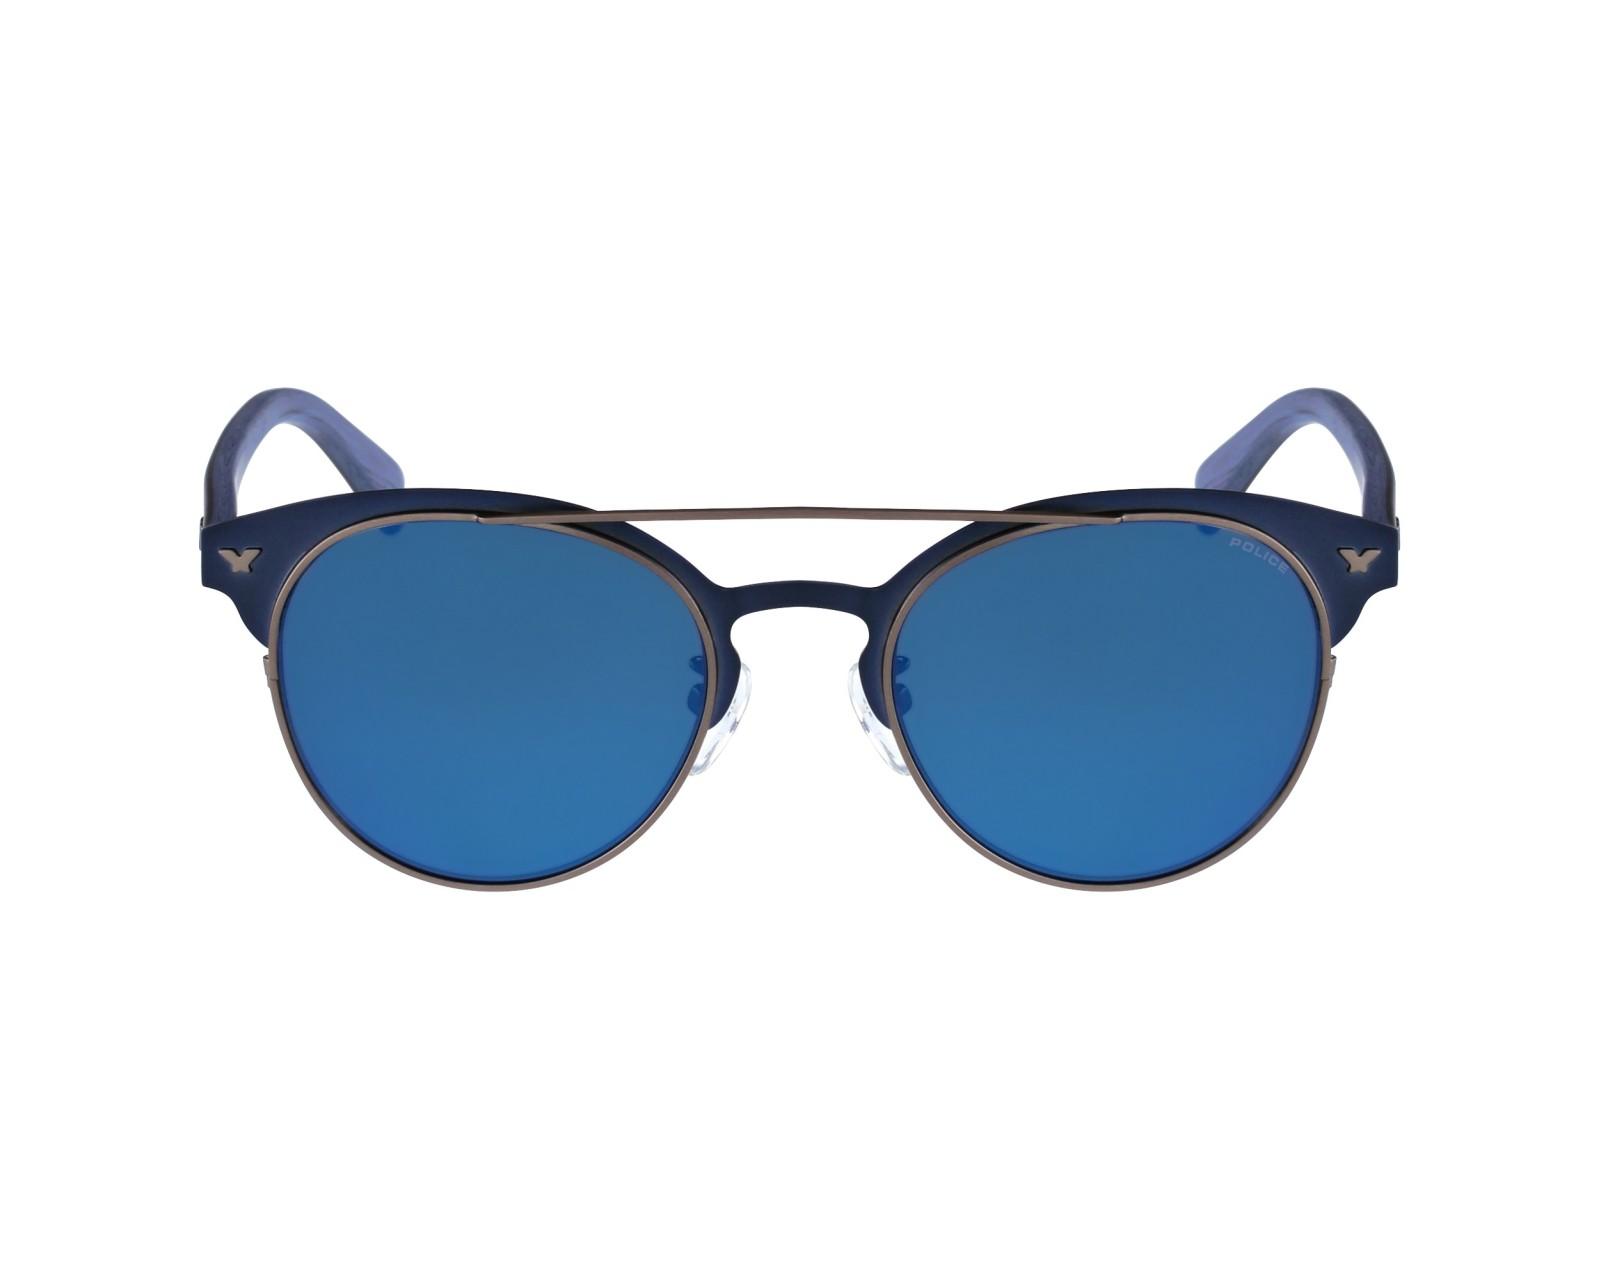 lunettes de soleil momentum 2 de police en s 8950 8ktb. Black Bedroom Furniture Sets. Home Design Ideas